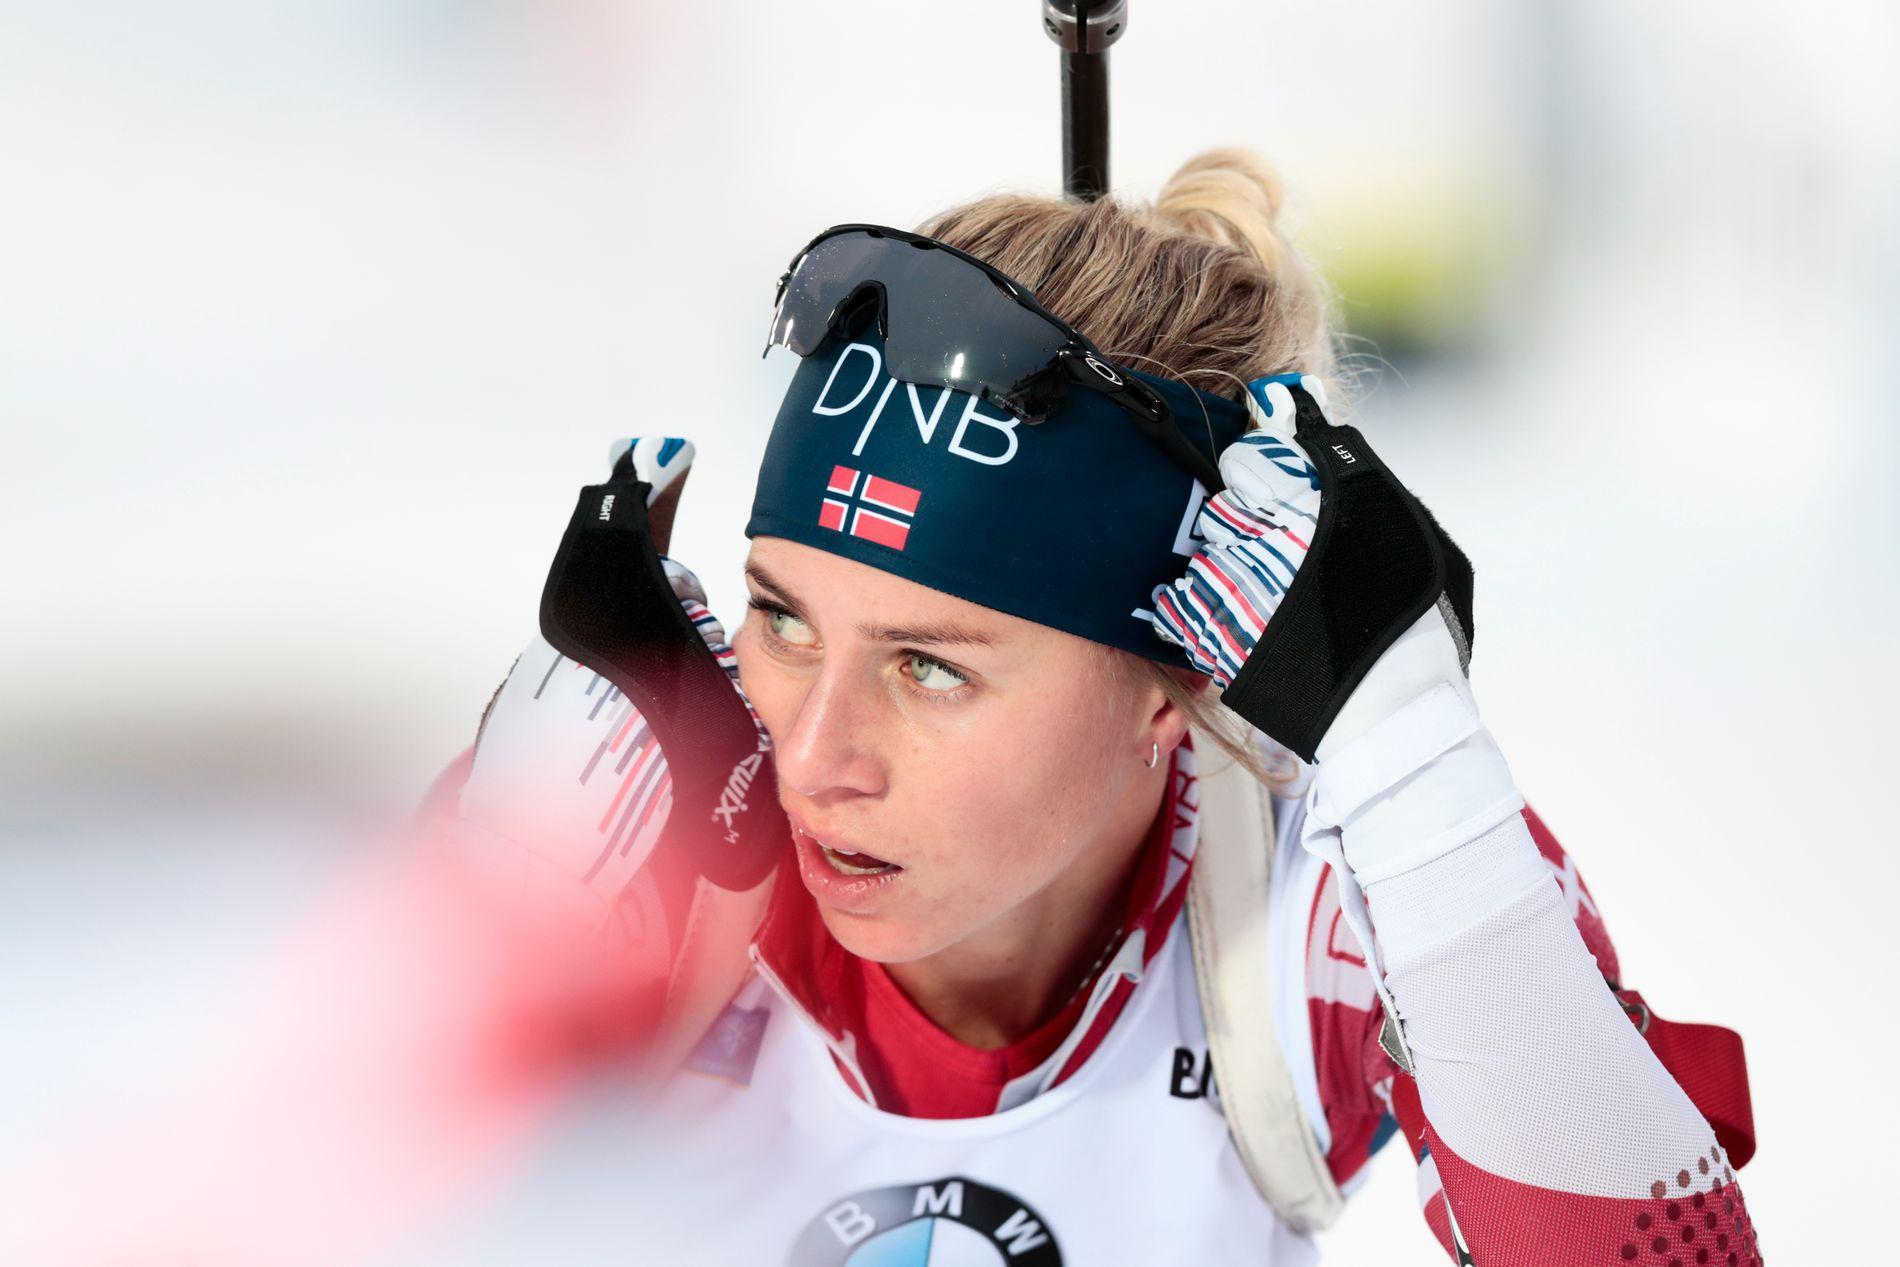 LANGT BAK: Fredag endte Tiril Eckhoff på 78.-plass i Hochfilzen. Her fra jaktstarten i Östersund, der hun ble nummer 41.